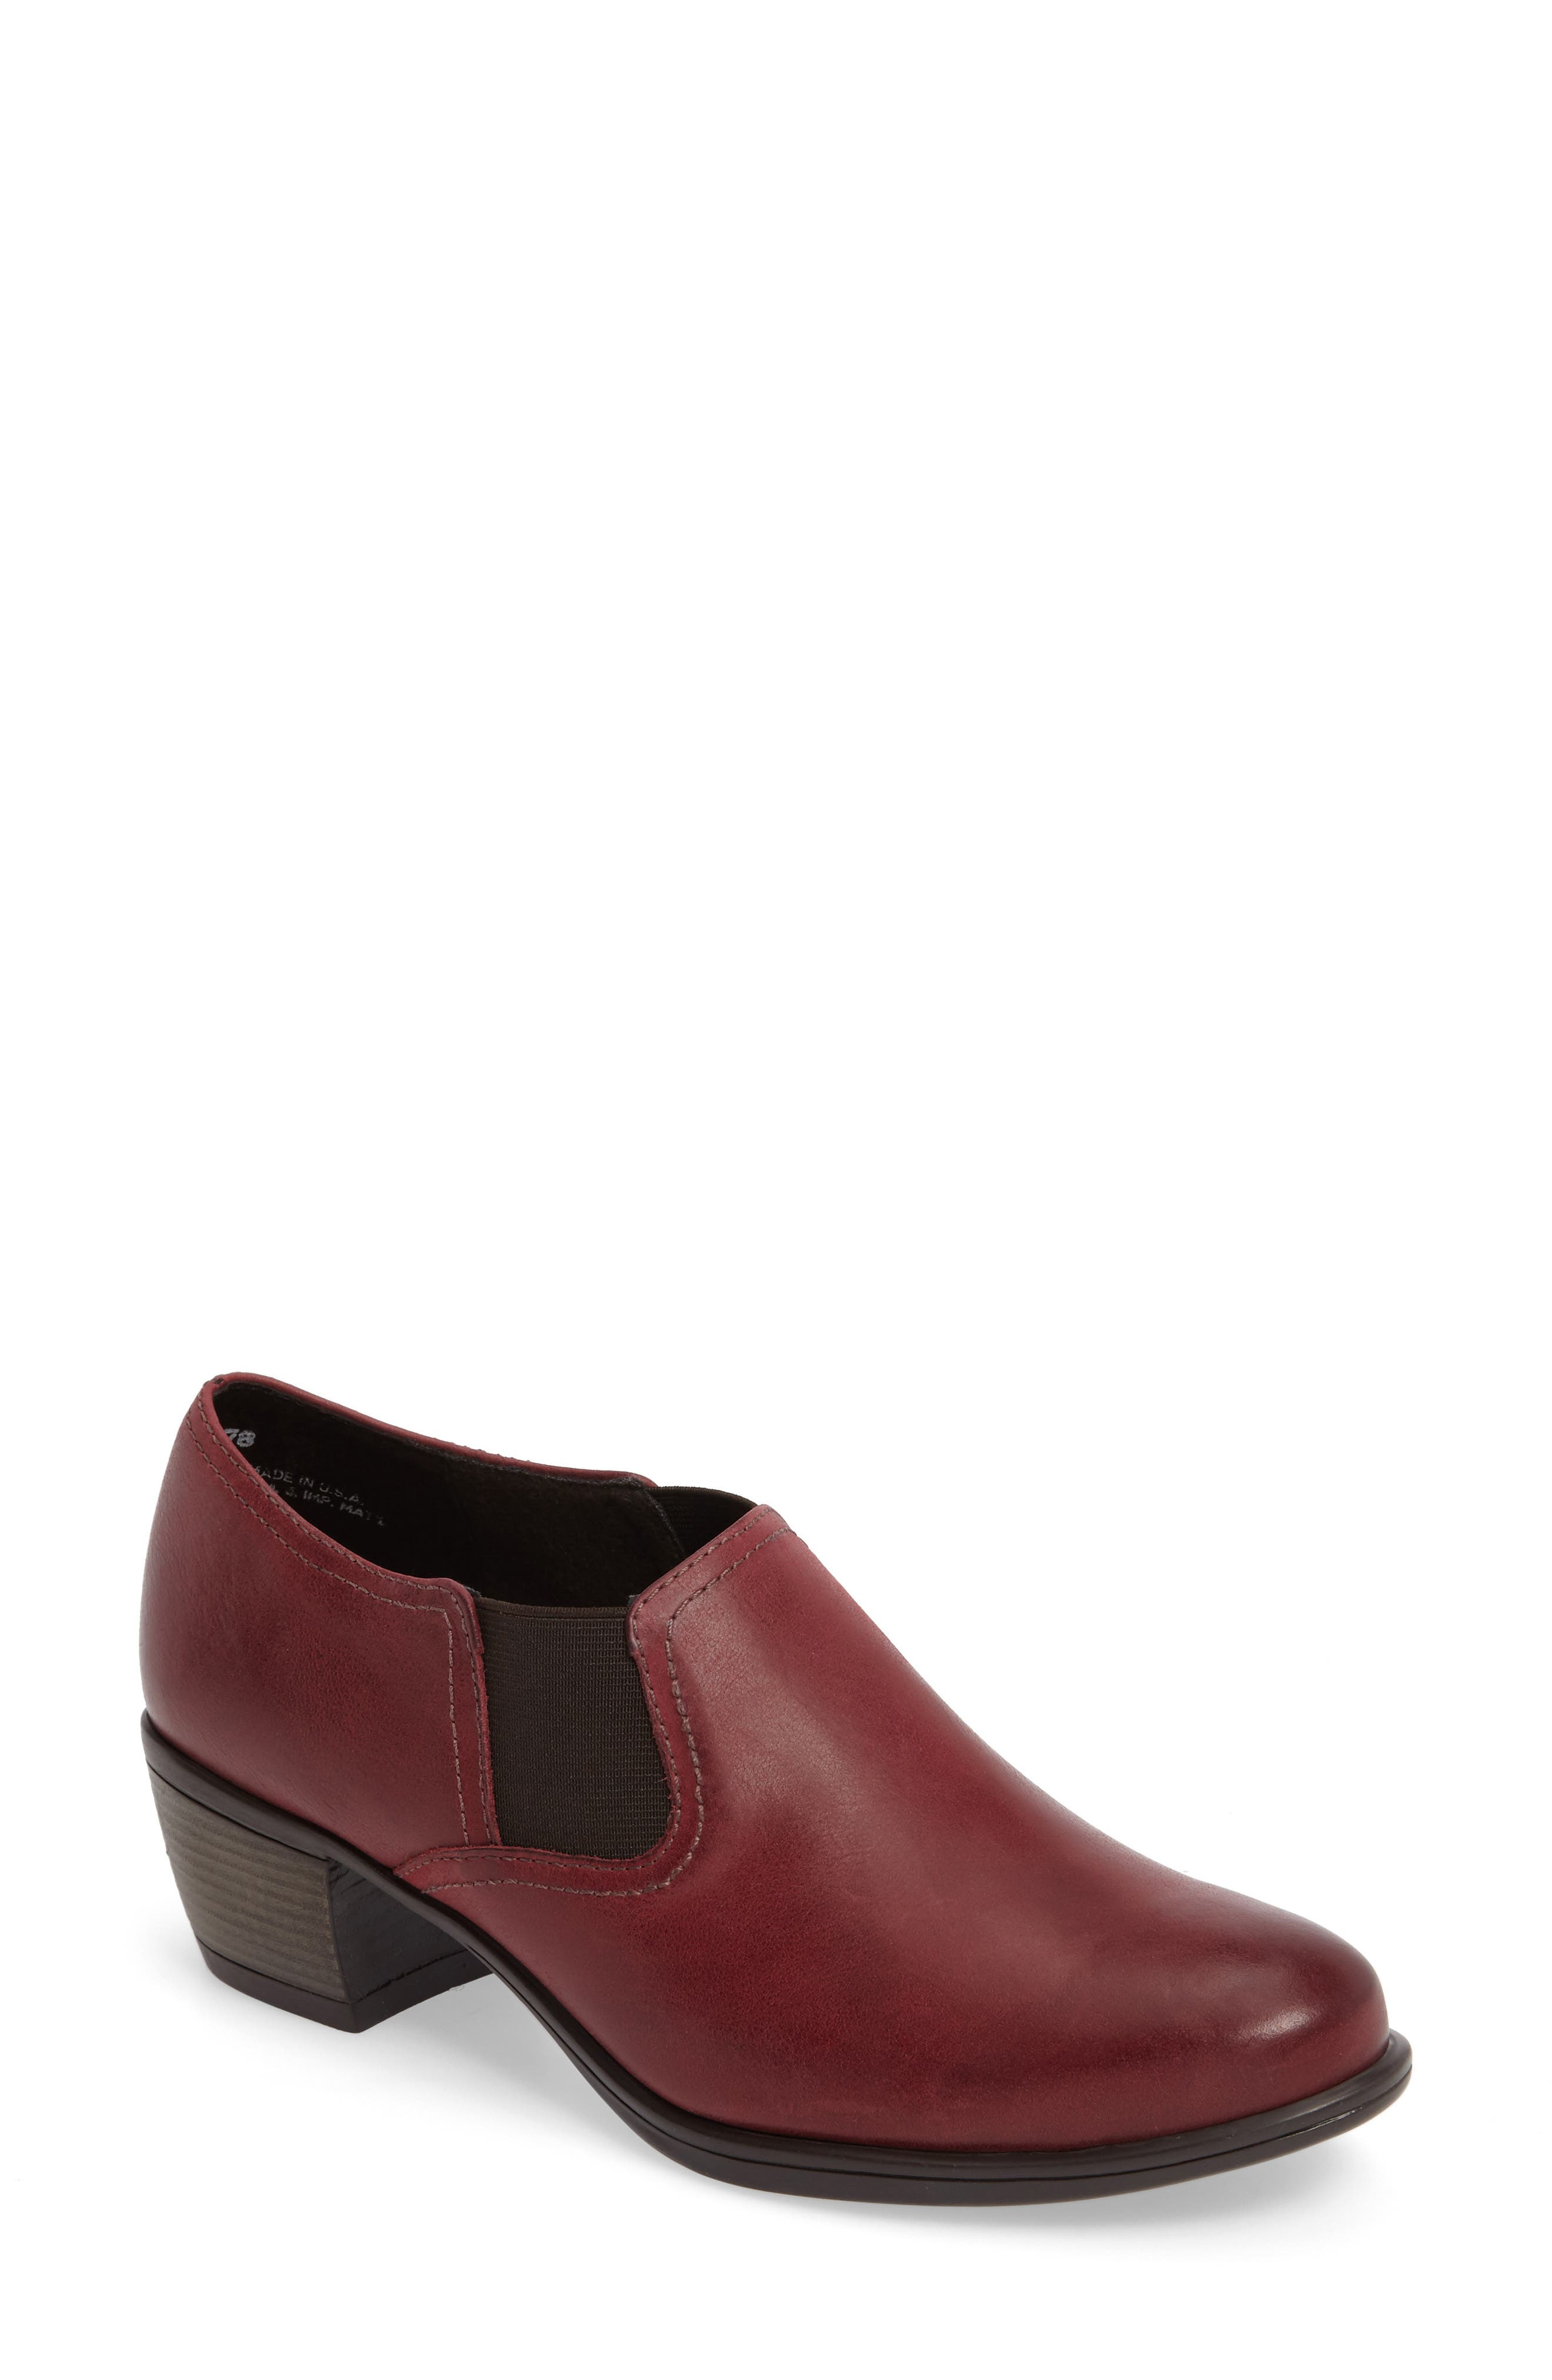 Frisco Bootie,                         Main,                         color, Wine Leather